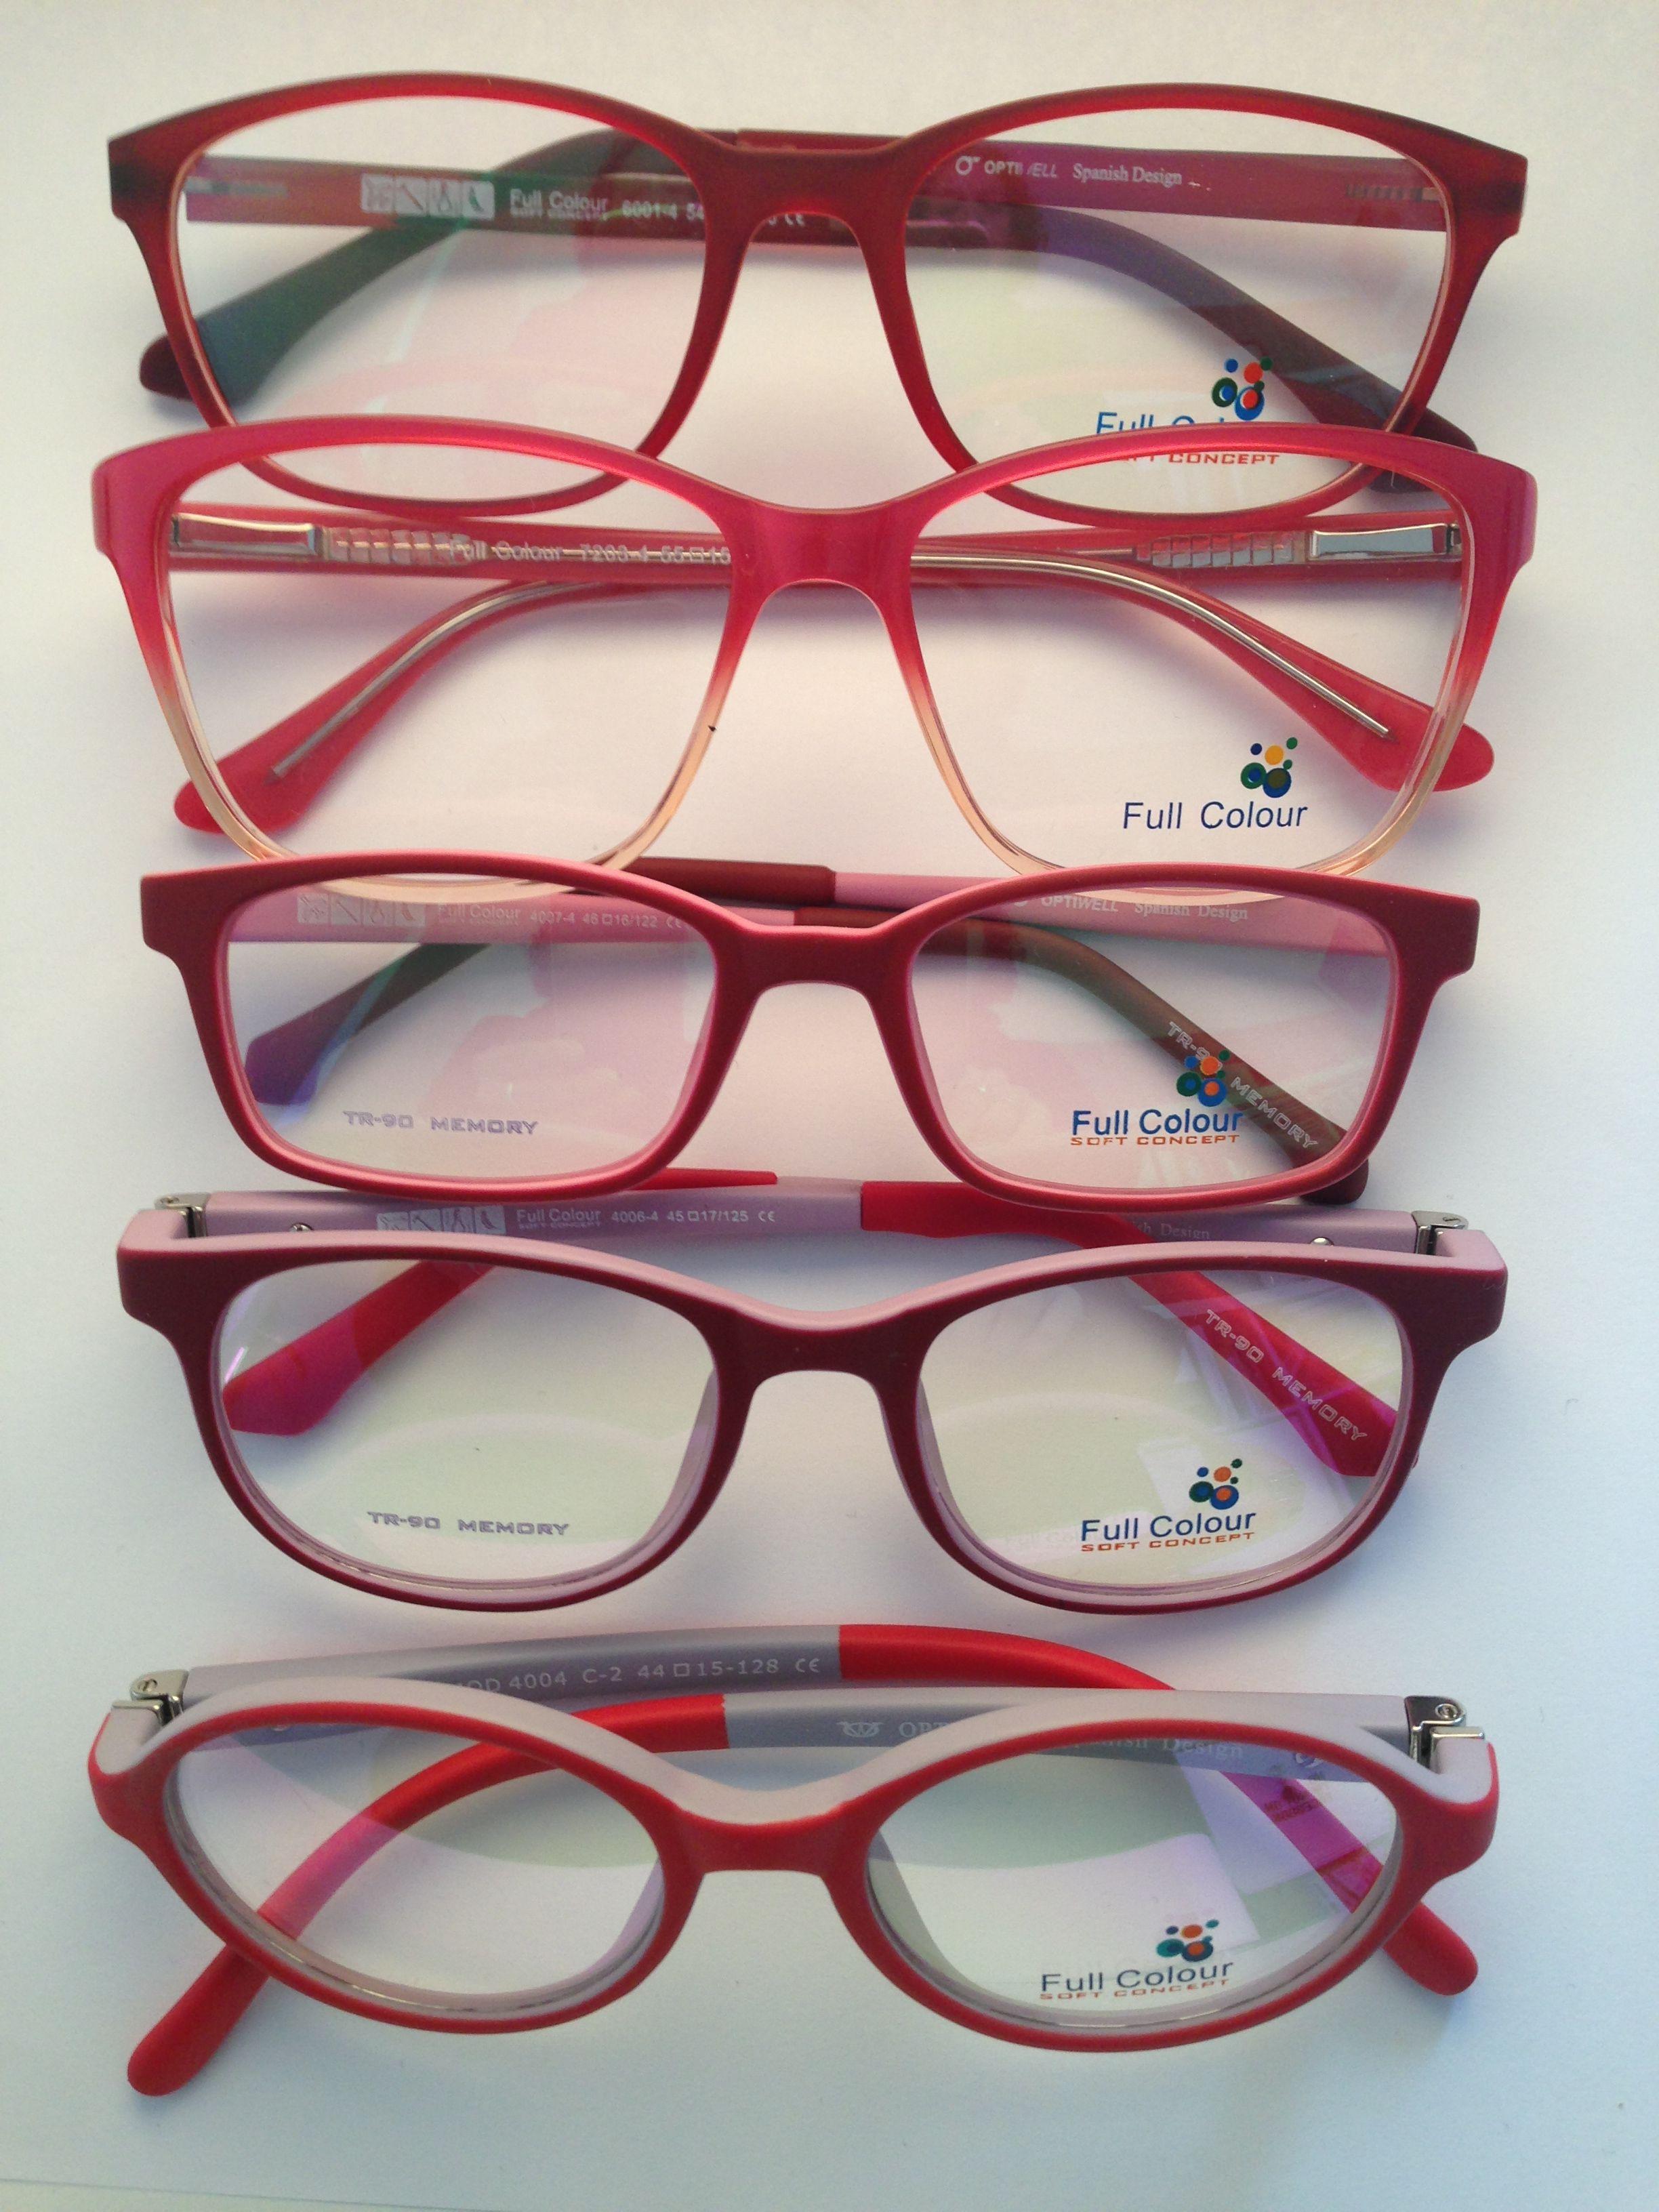 gafas graduadas mujer - Buscar con Google | Lentes | Pinterest ...